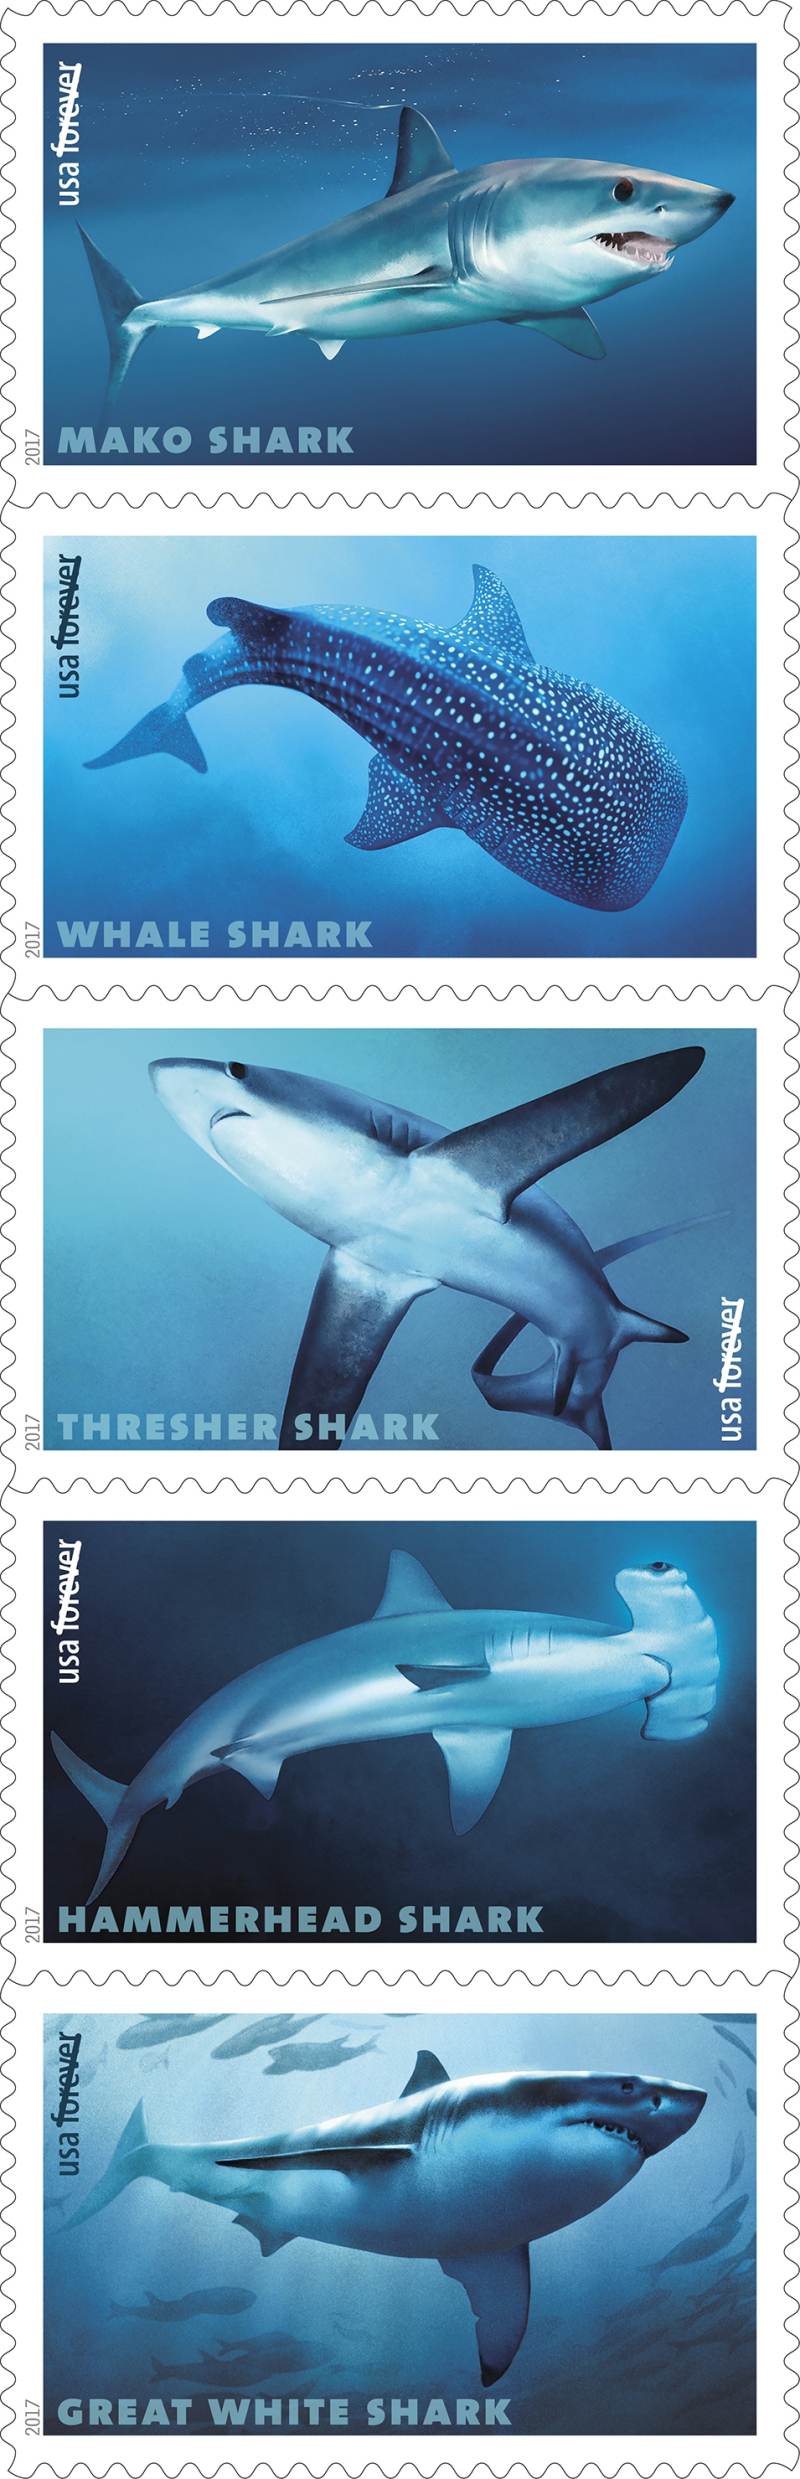 17-Sharks-stamps3